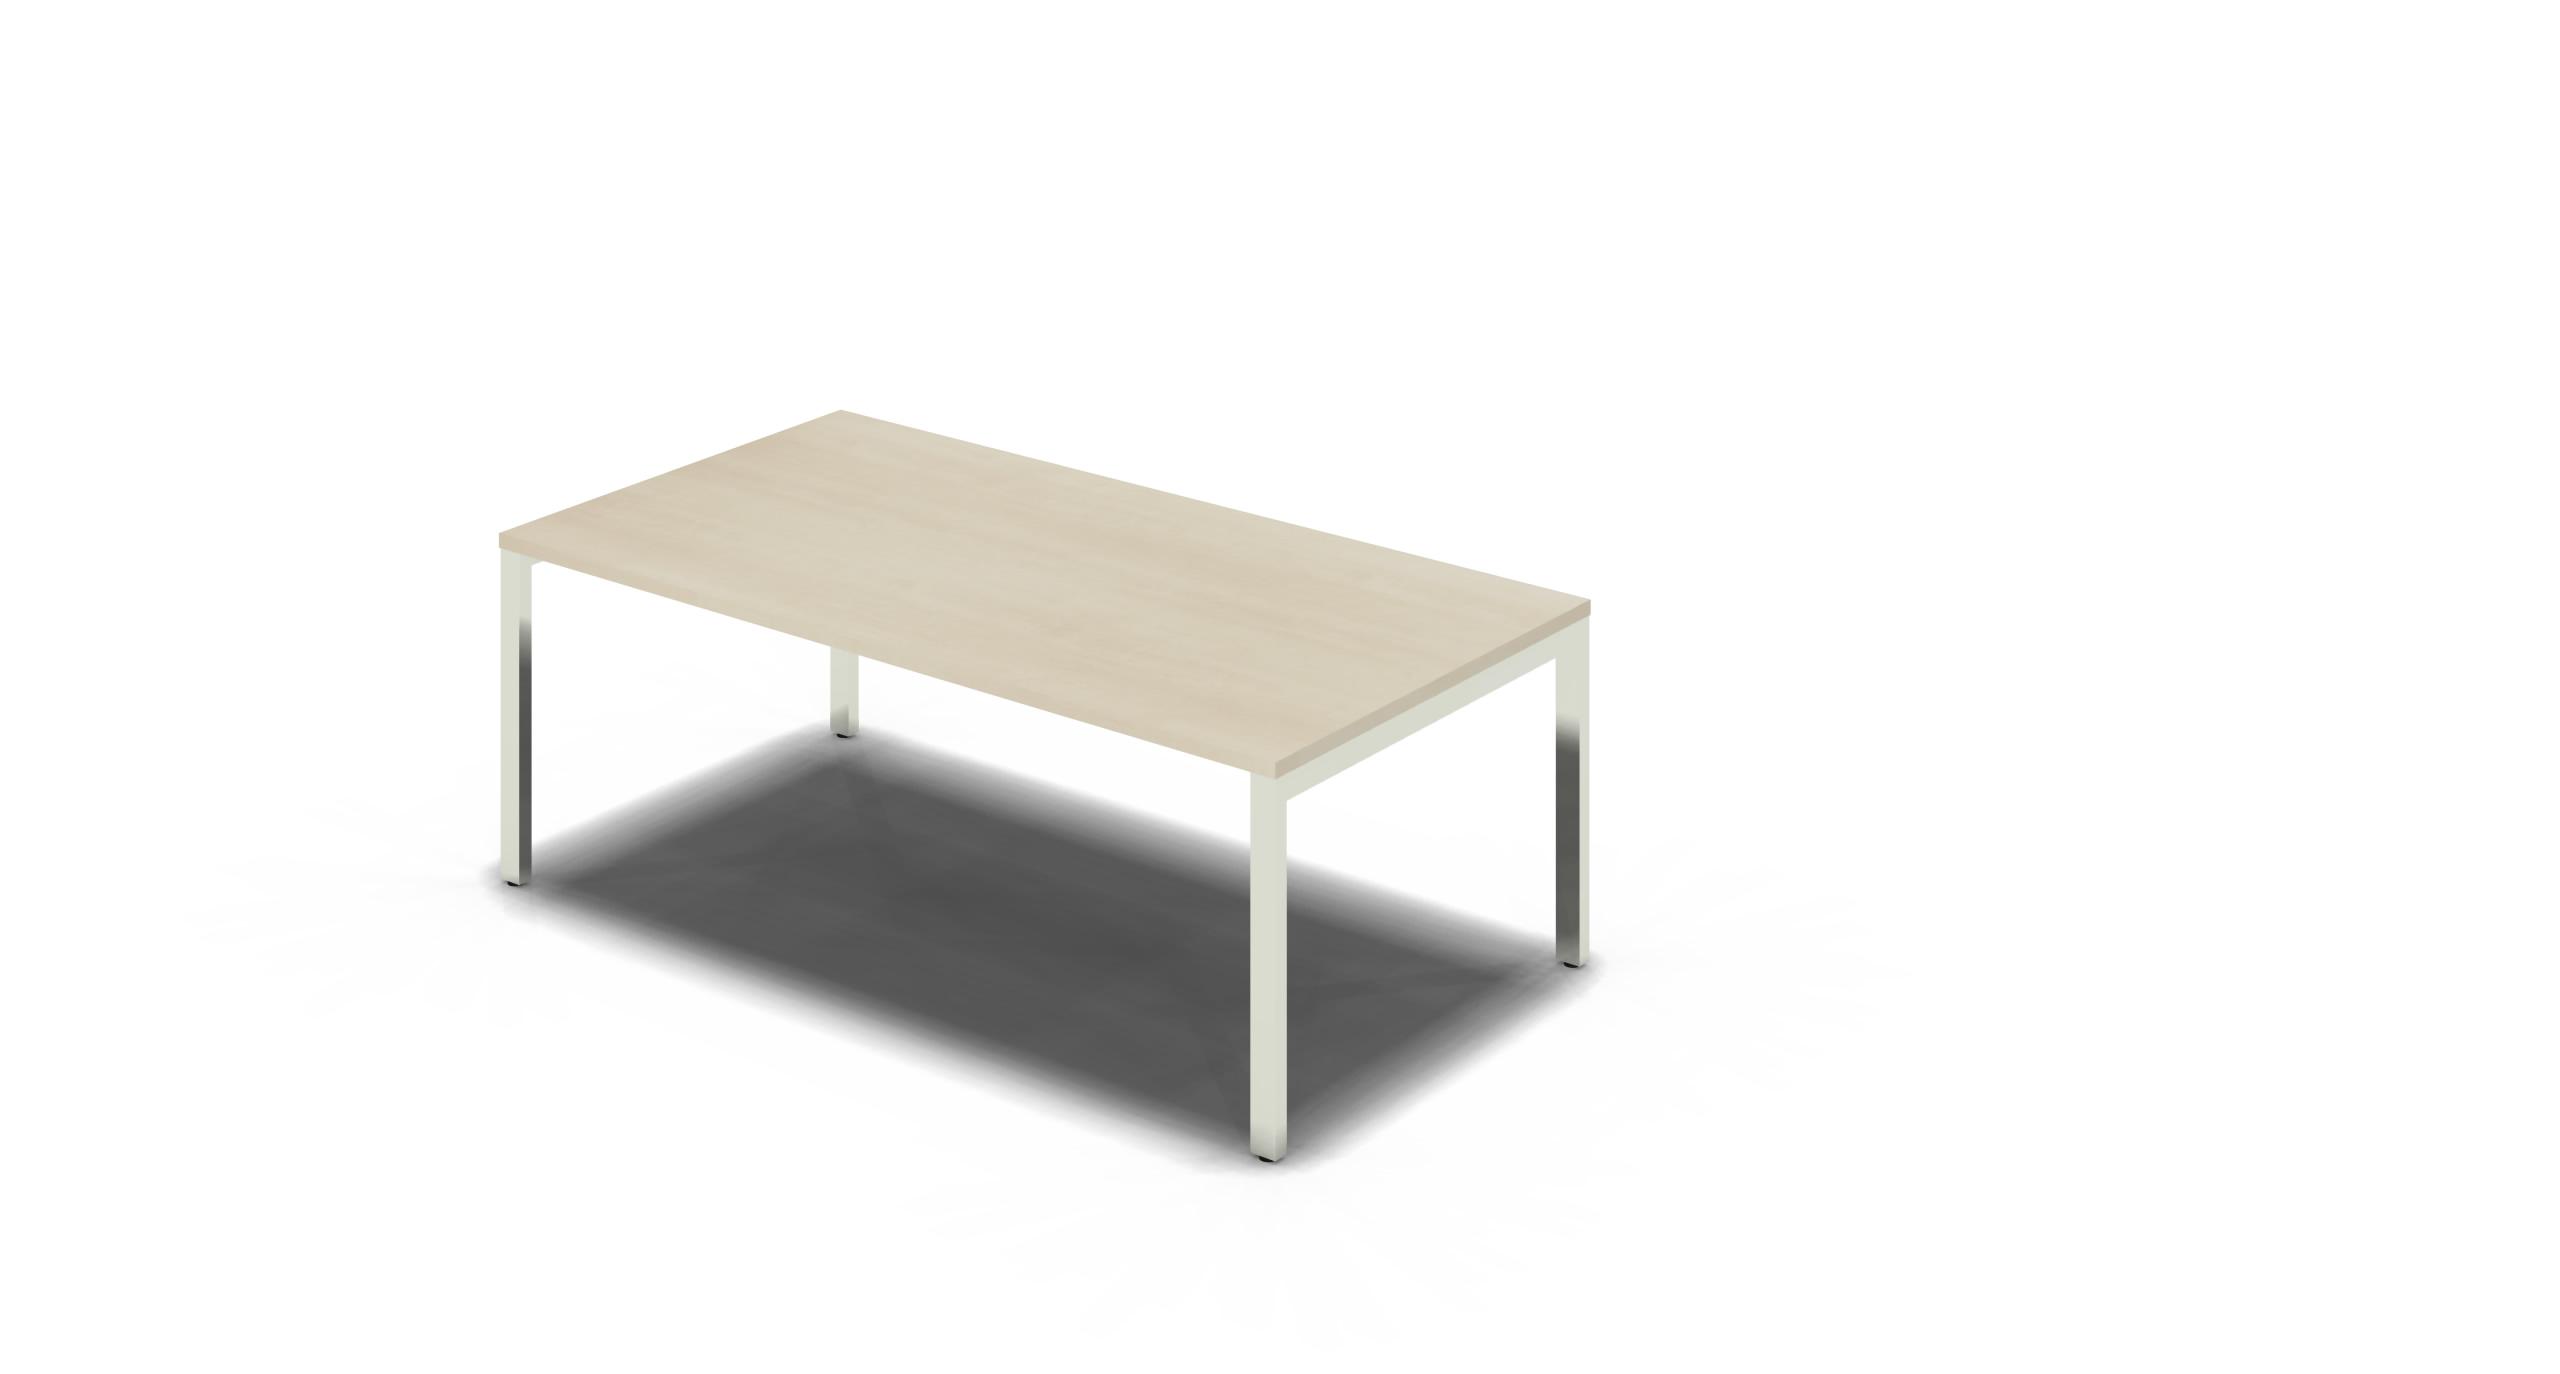 Table_Square_1800x900_Chrome_Maple_noOption